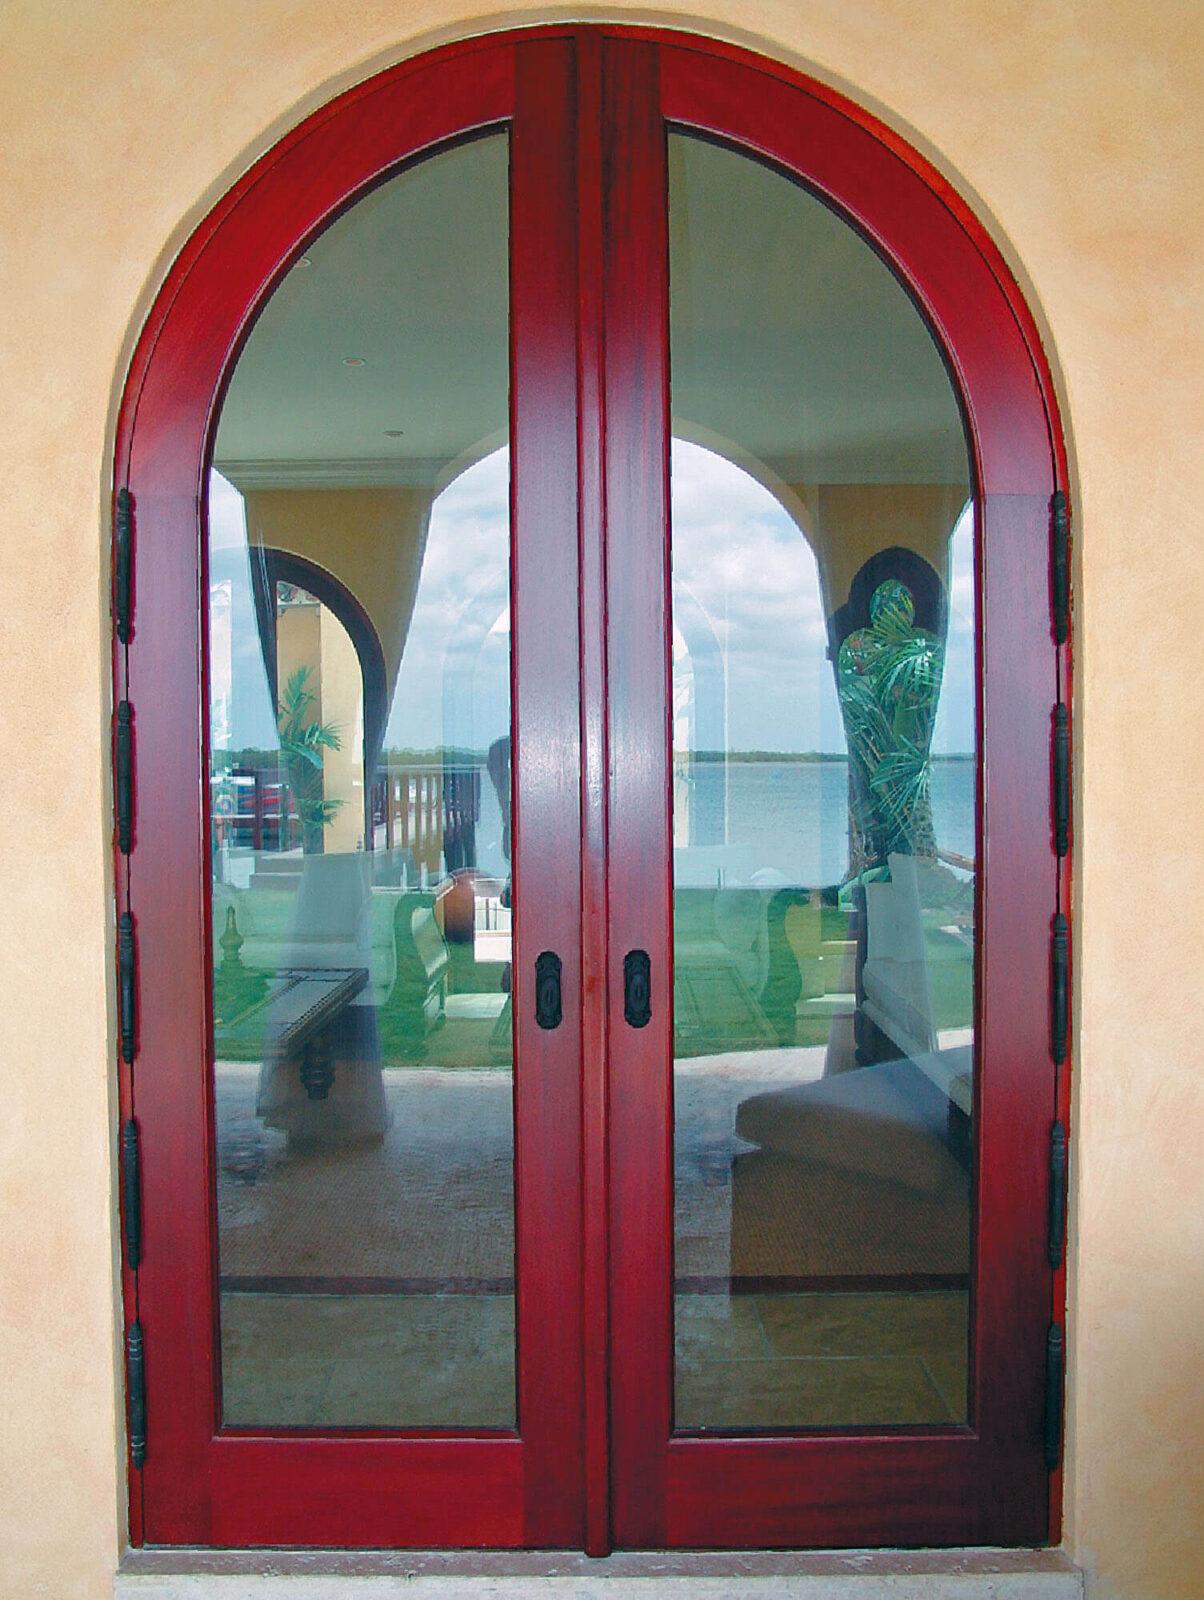 SUNSET ISLAND MAHOGANY DOOR.